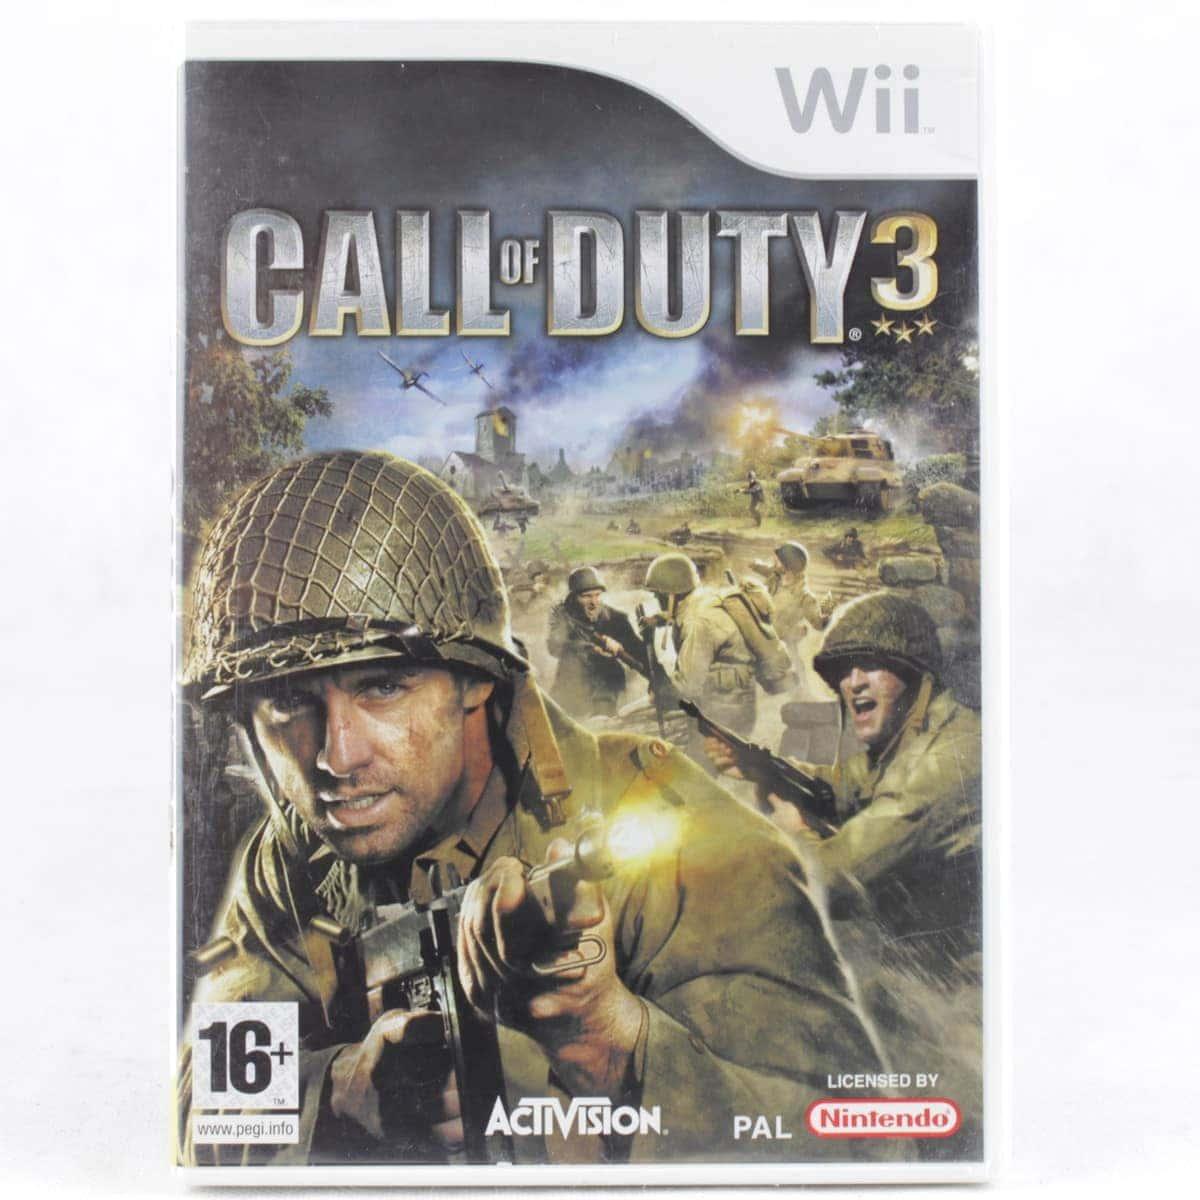 Call of Duty 3 (Nintendo Wii)